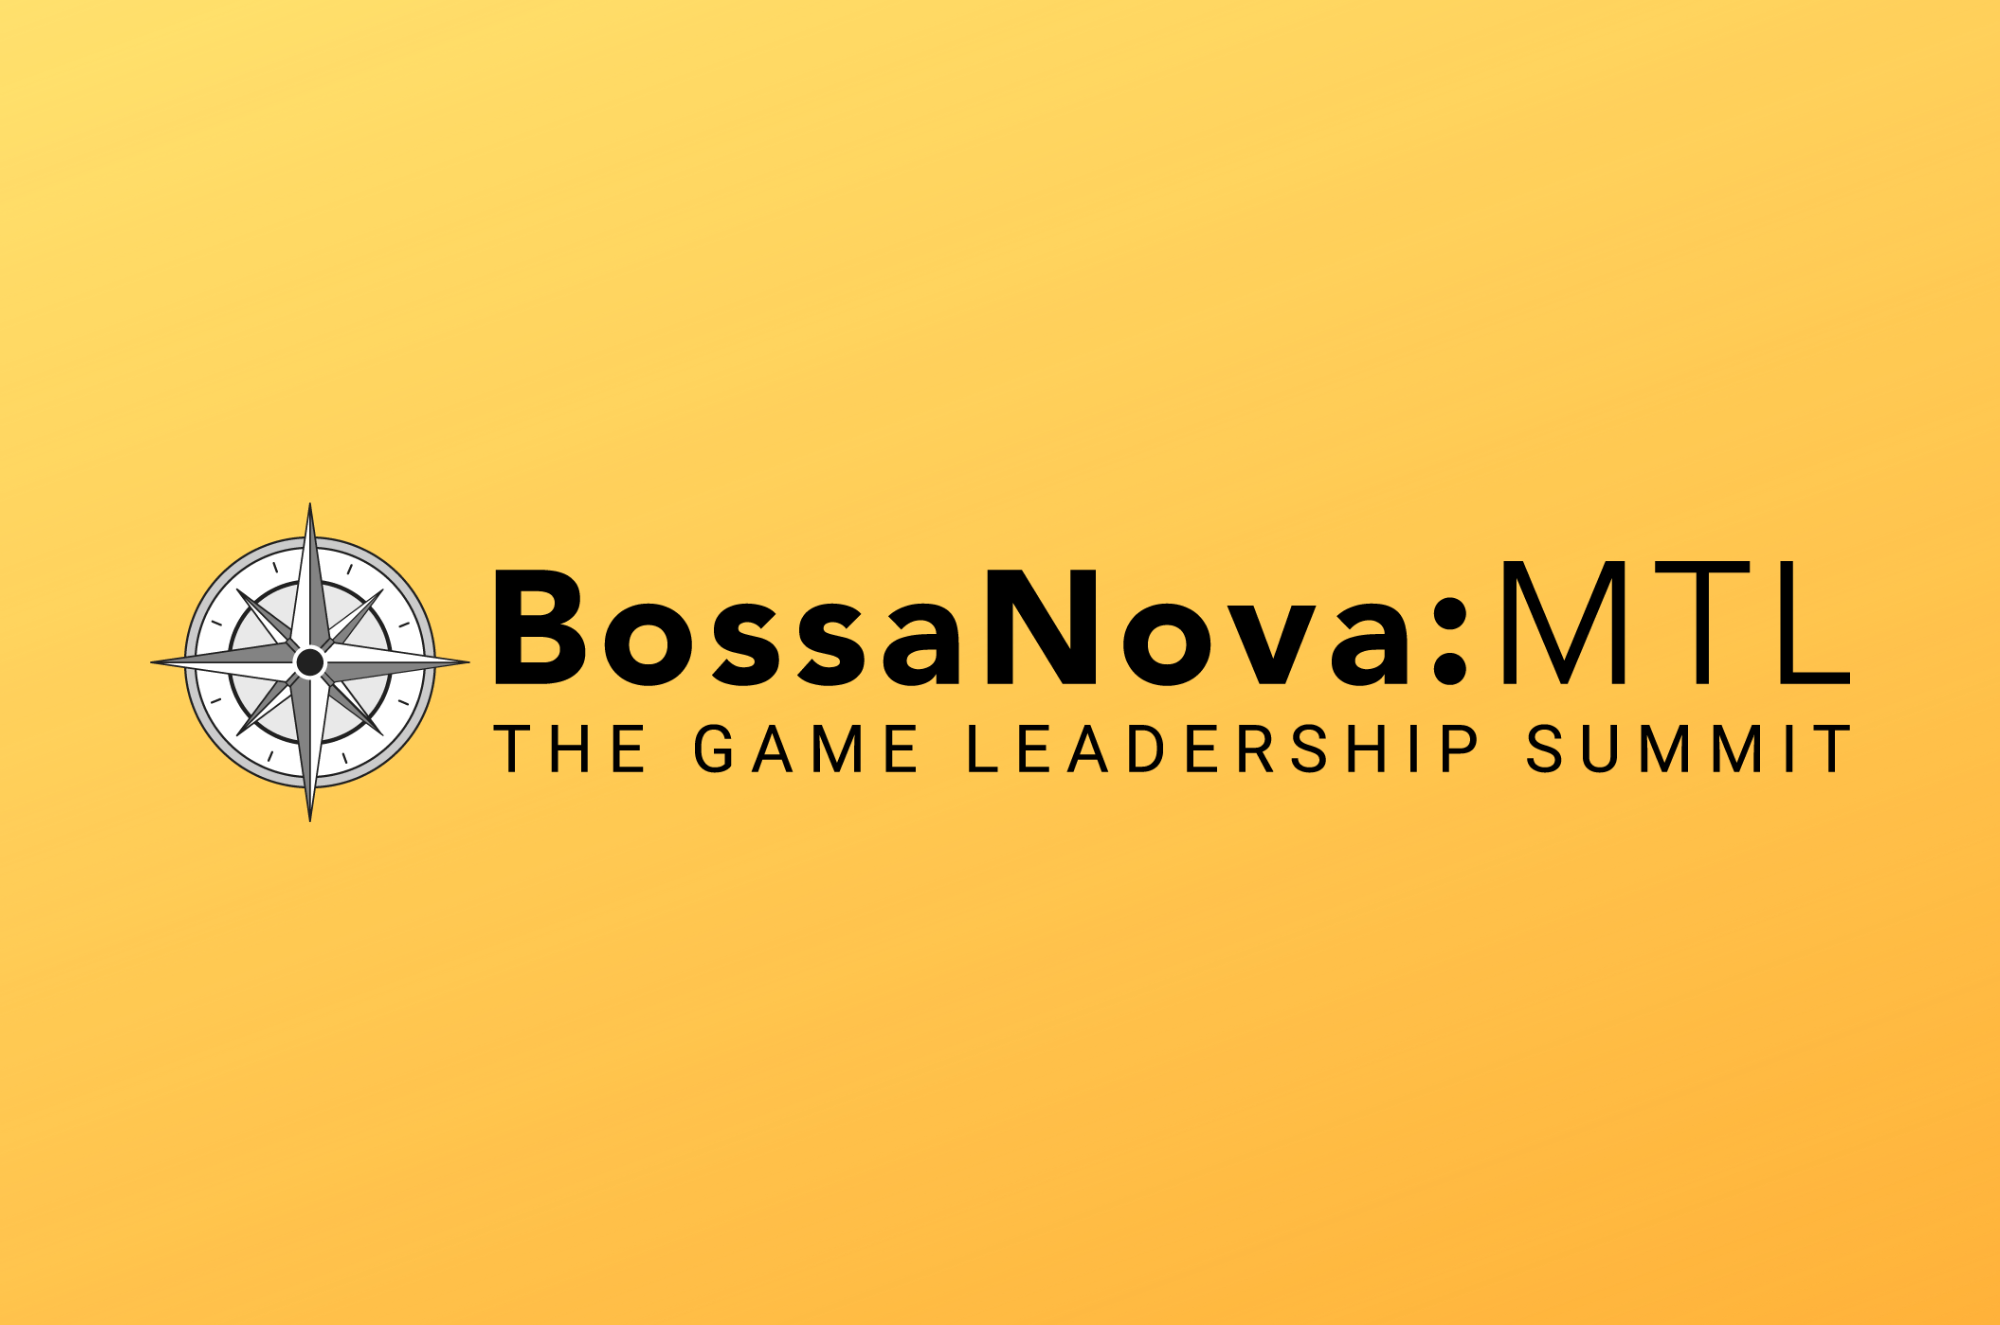 BossaNova:MTL - The Game Leadership Summit